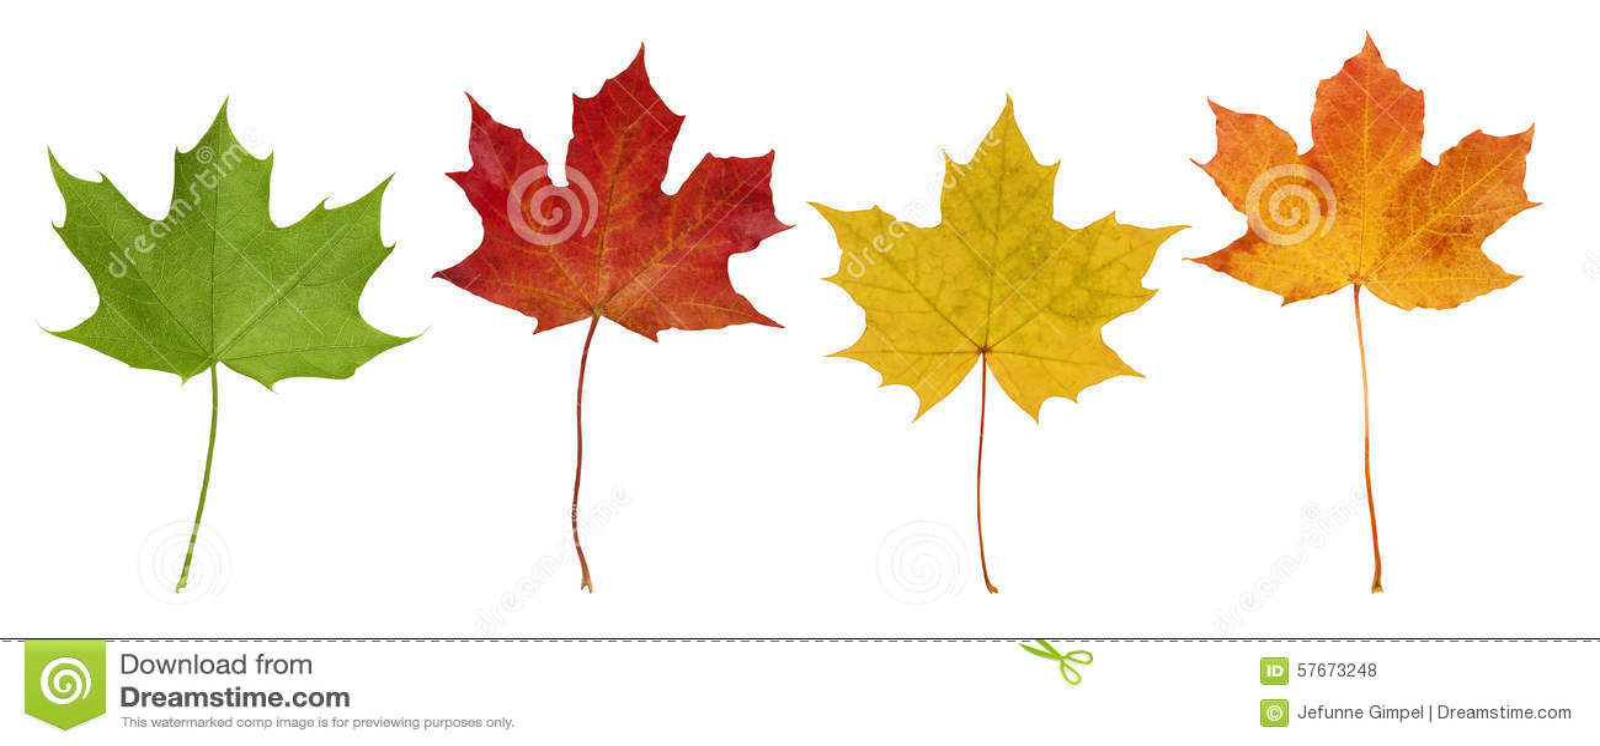 Basic_Maple_Leaves